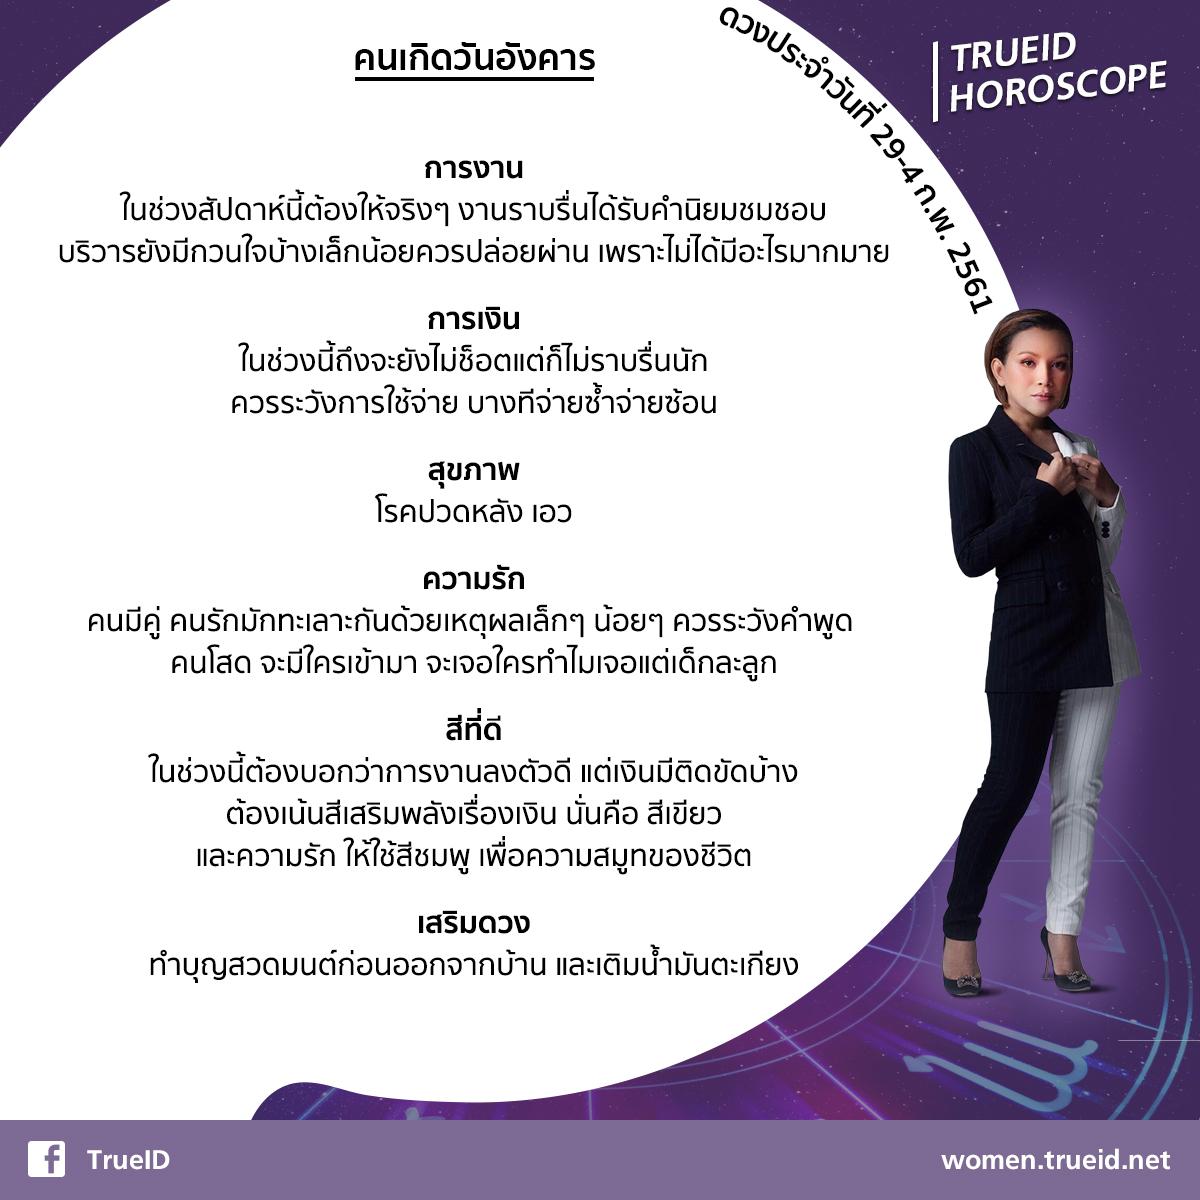 TrueID Horoscope : ดูดวง รายสัปดาห์ แม่นๆ 29-4 ก.พ. 61 โดย หมอดู Toktak A4